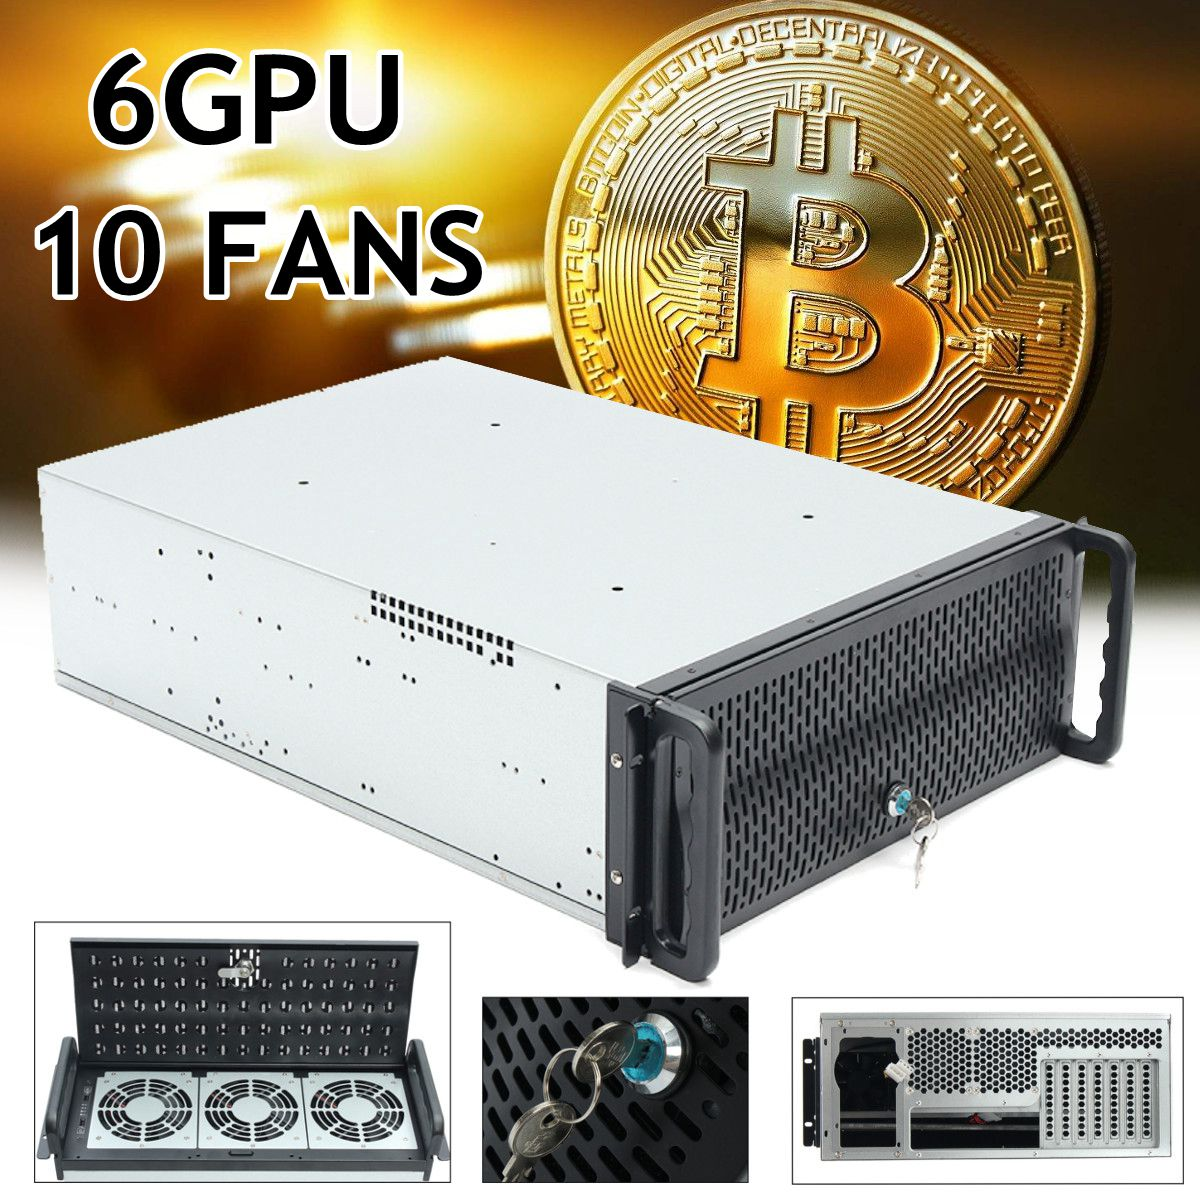 6 GPU 4U Rackmount Miner горная рама горная сервер чехол с 10 вентиляторами Rsiers рамка Rig